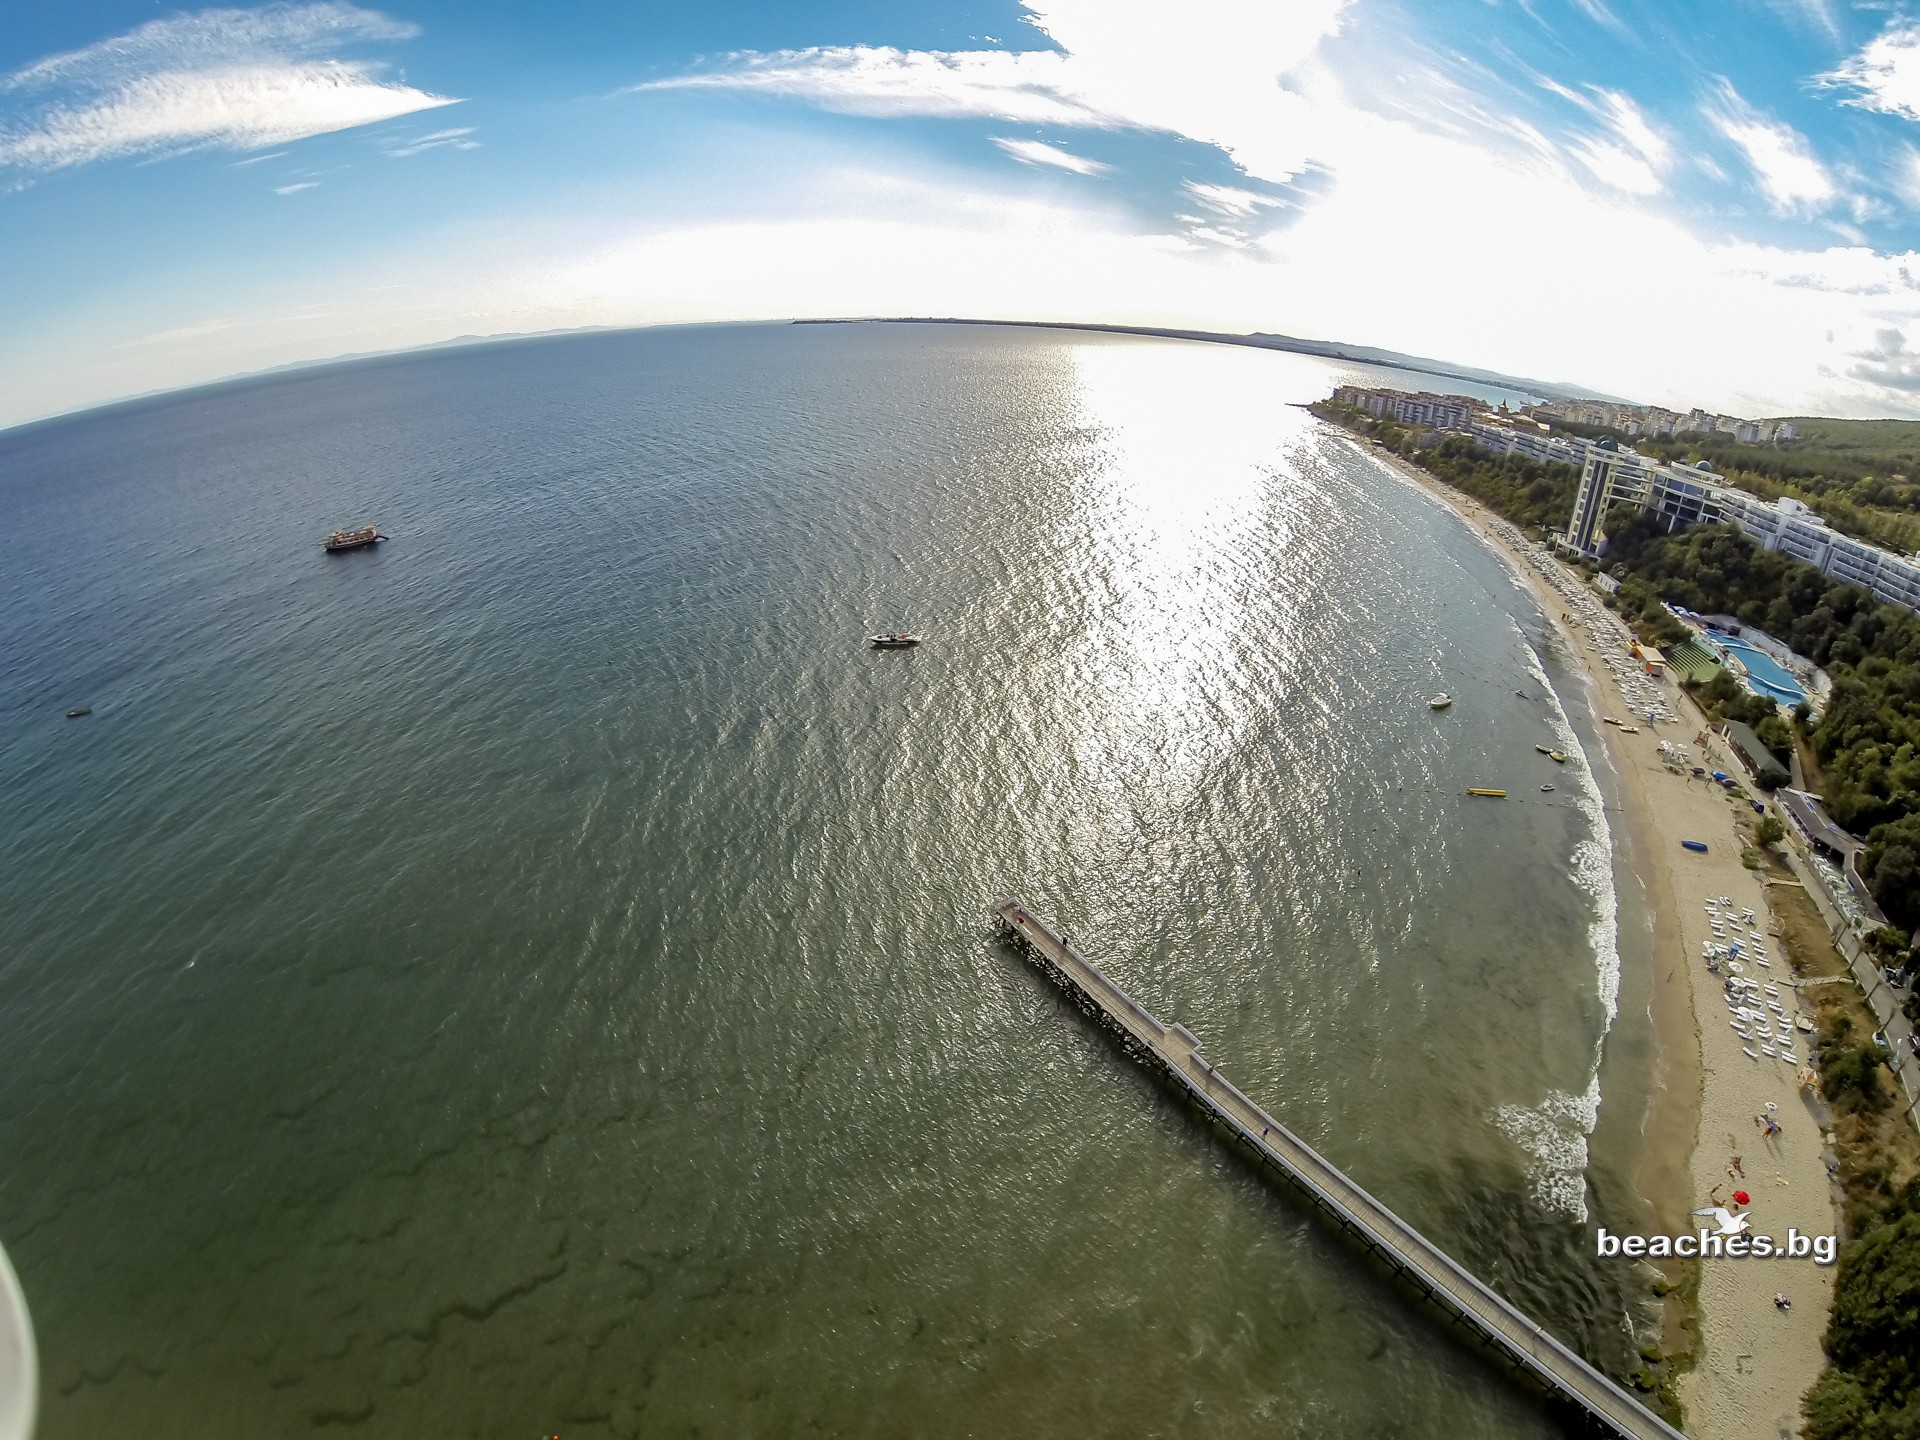 beaches.bg - Плаж Робинзон, Свети Влас, България